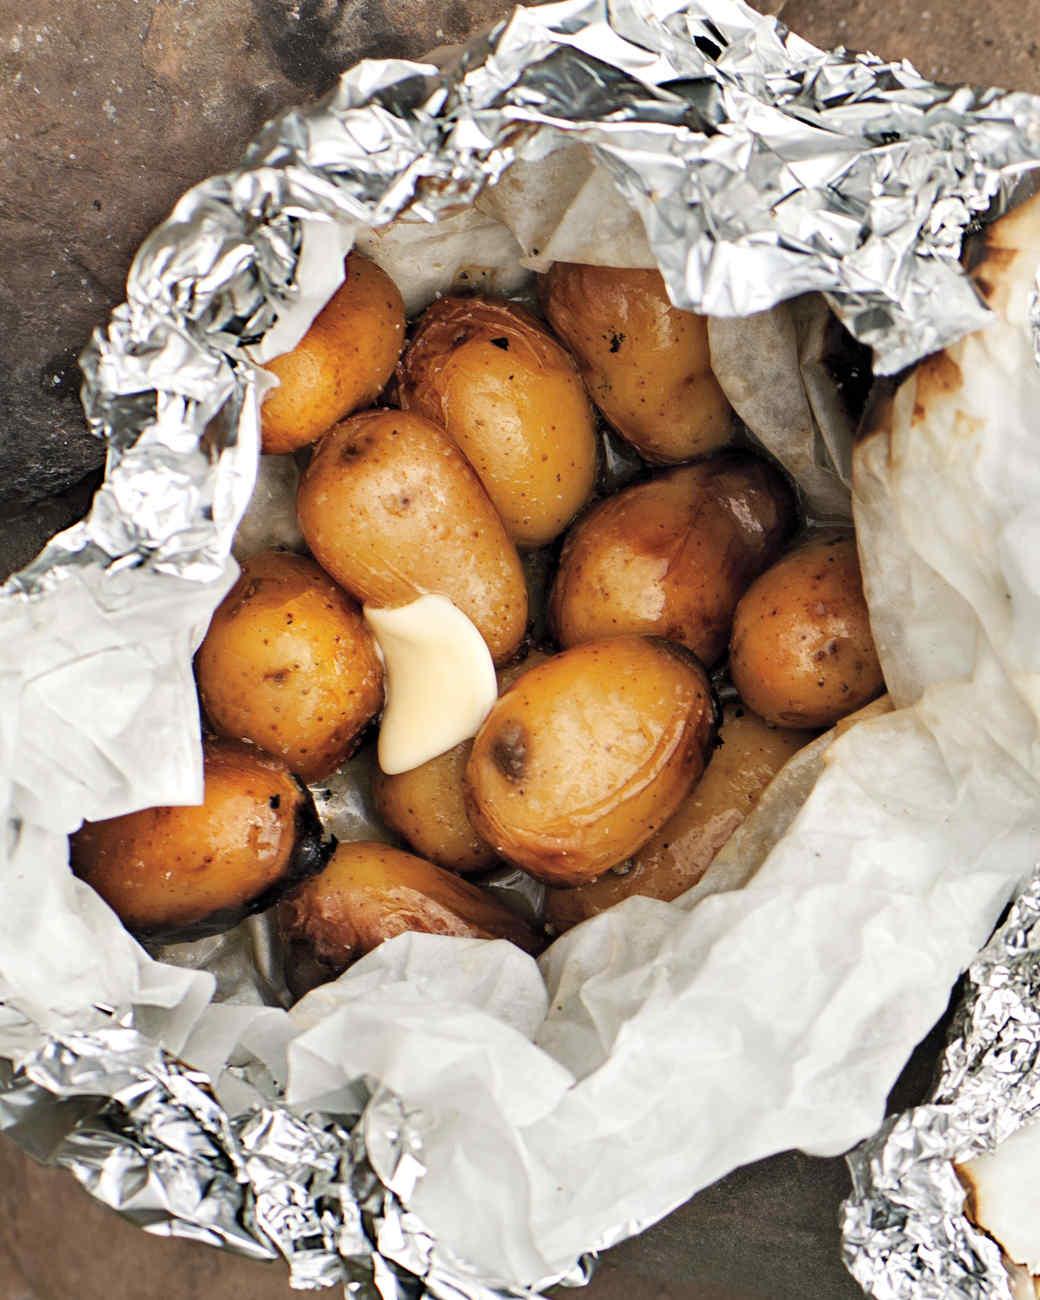 potato-packets-034-f-0611mld106657-copy-2.jpg